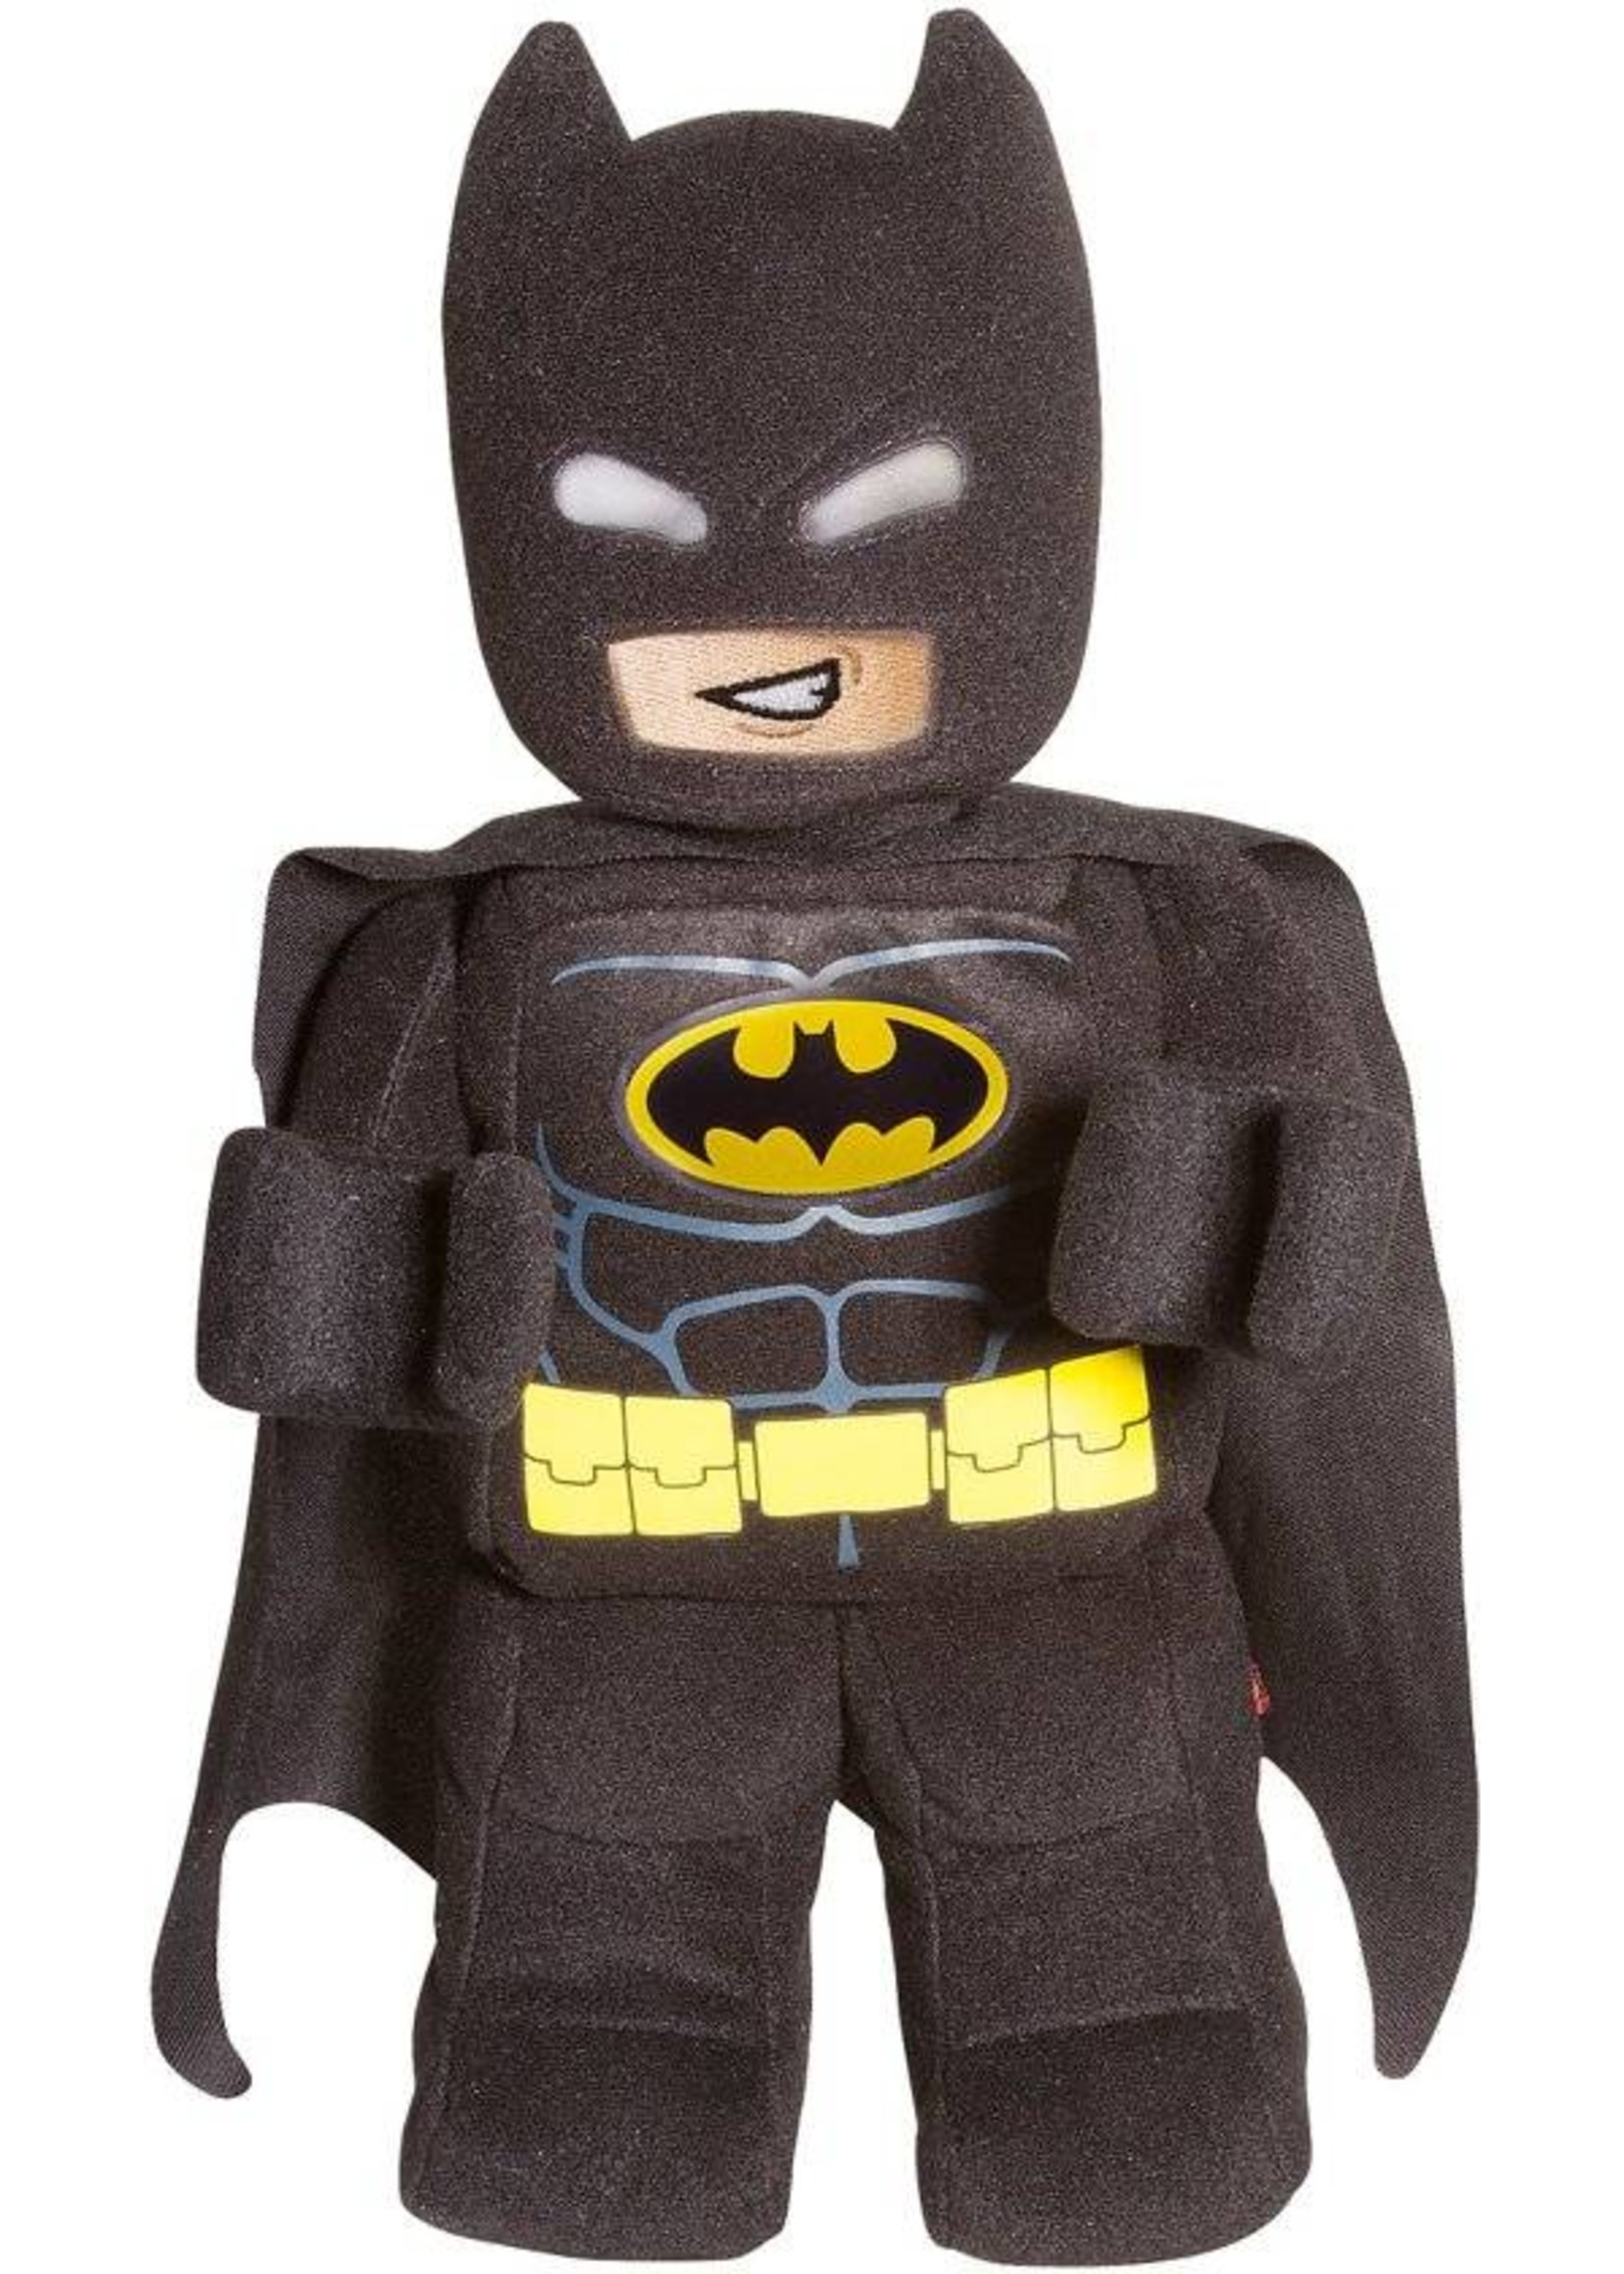 LEGO Minifigures Batman Minifigure Plush 853652